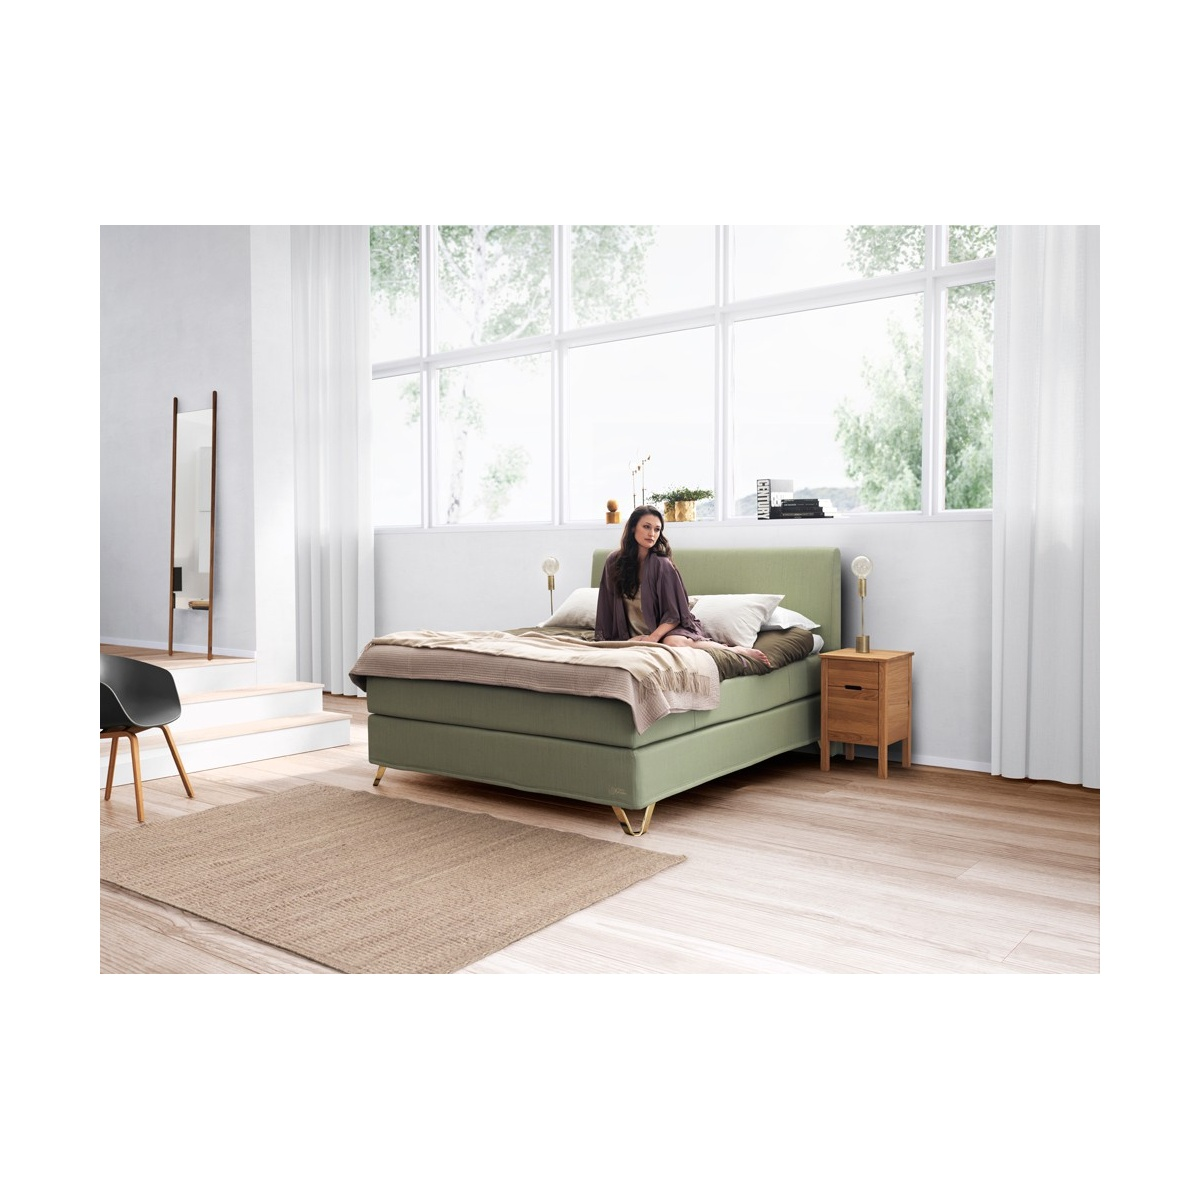 ko kontynentalne supreme continental jensen. Black Bedroom Furniture Sets. Home Design Ideas